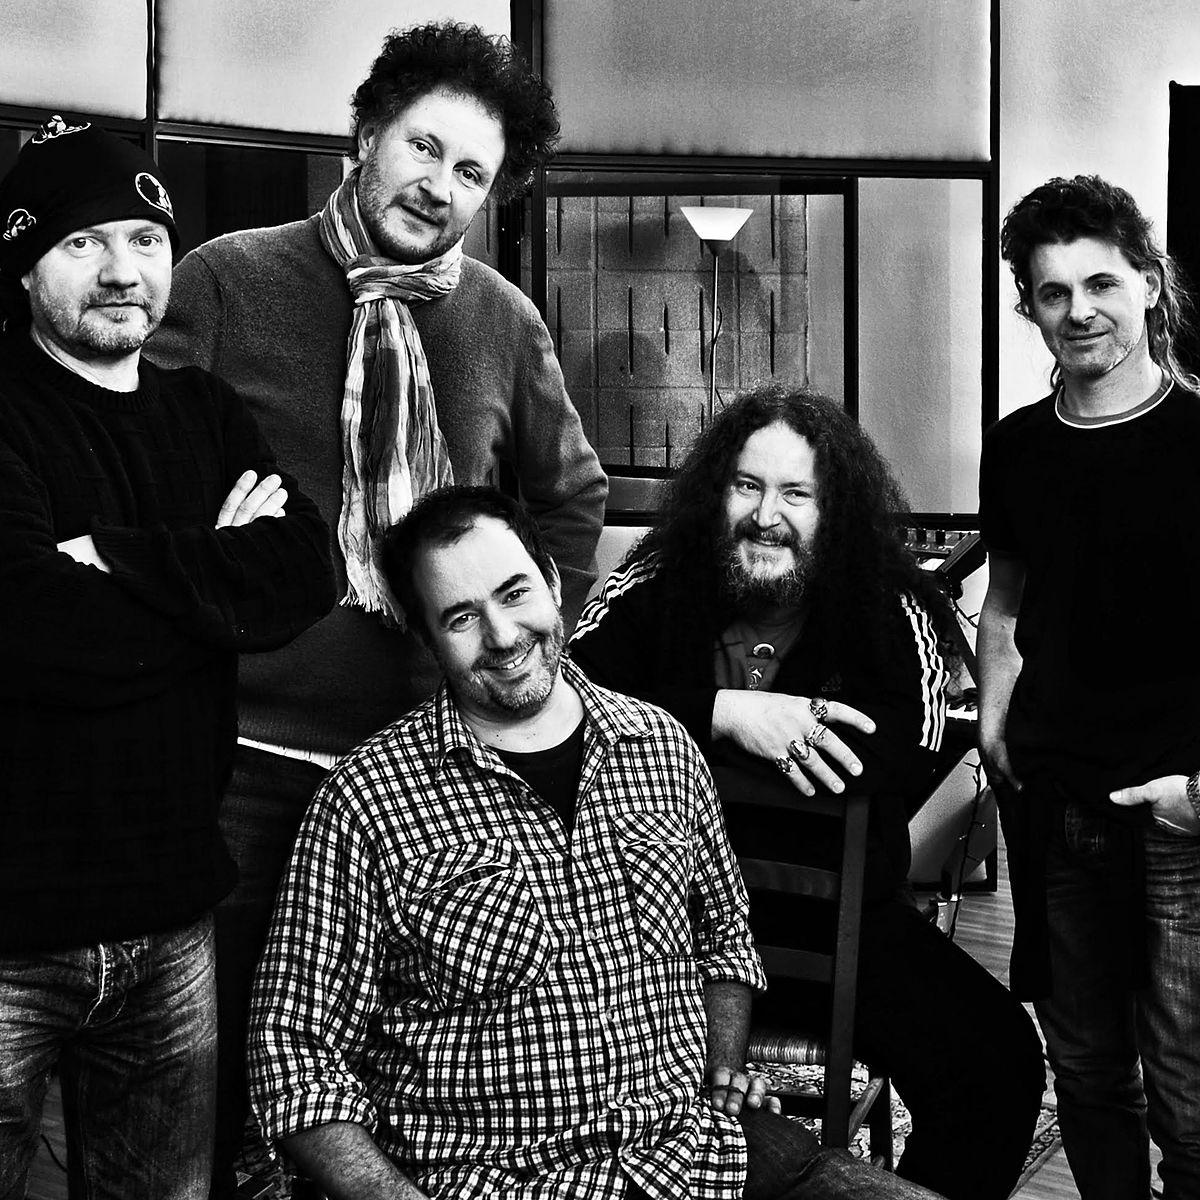 Banded Bands: Twenty Four Hours (band)